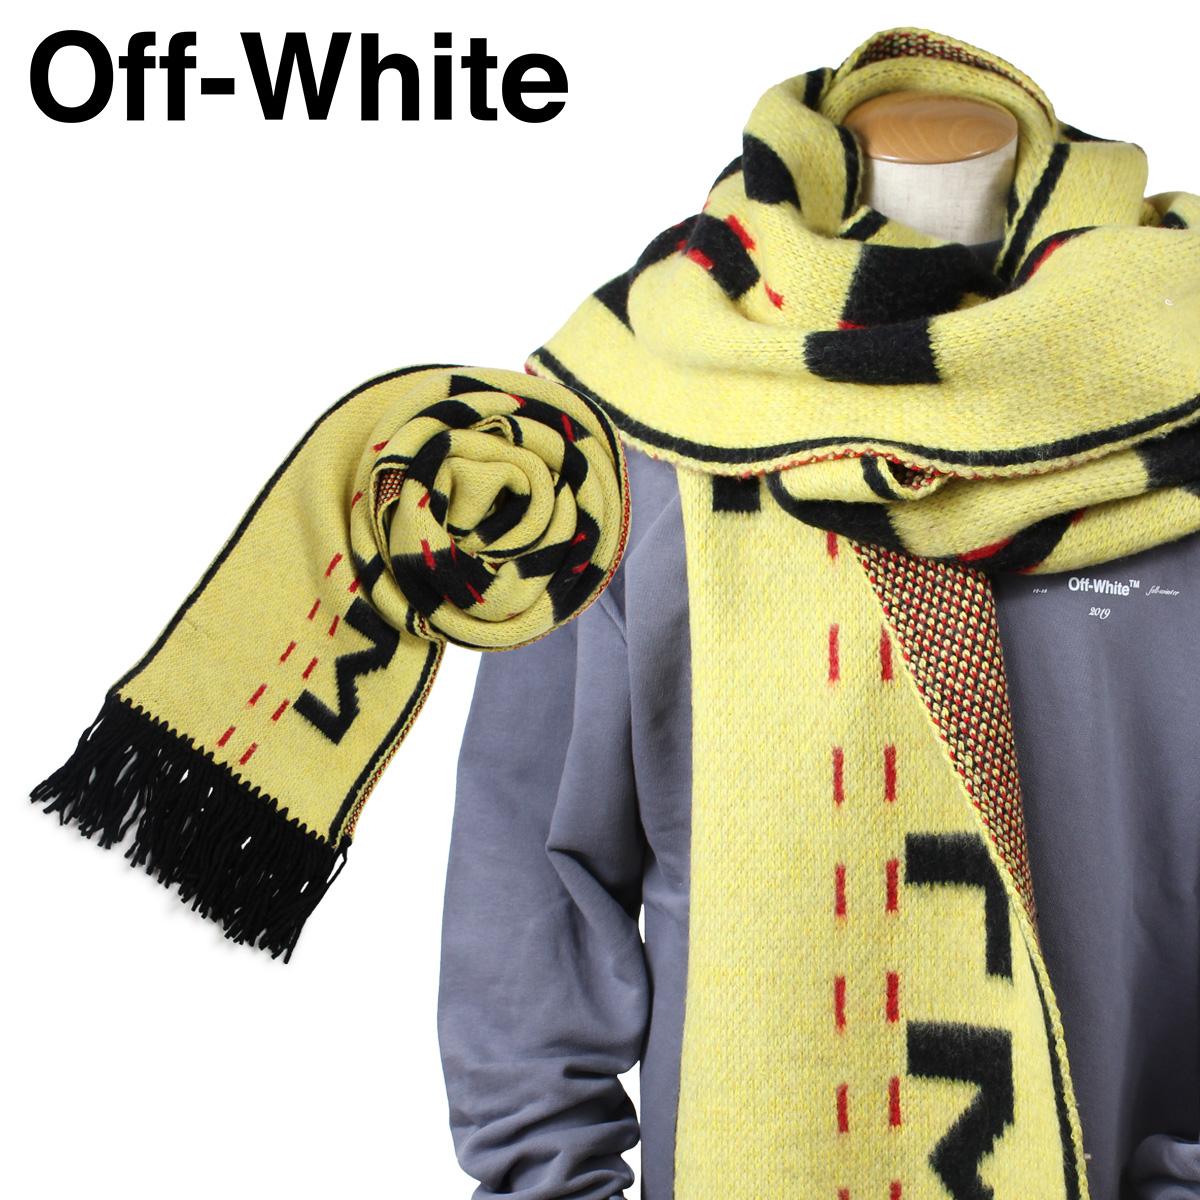 Off-white INDUSTRIAL SCARF オフホワイト マフラー メンズ レディース 大判 ウール イエロー OWMA009 553050